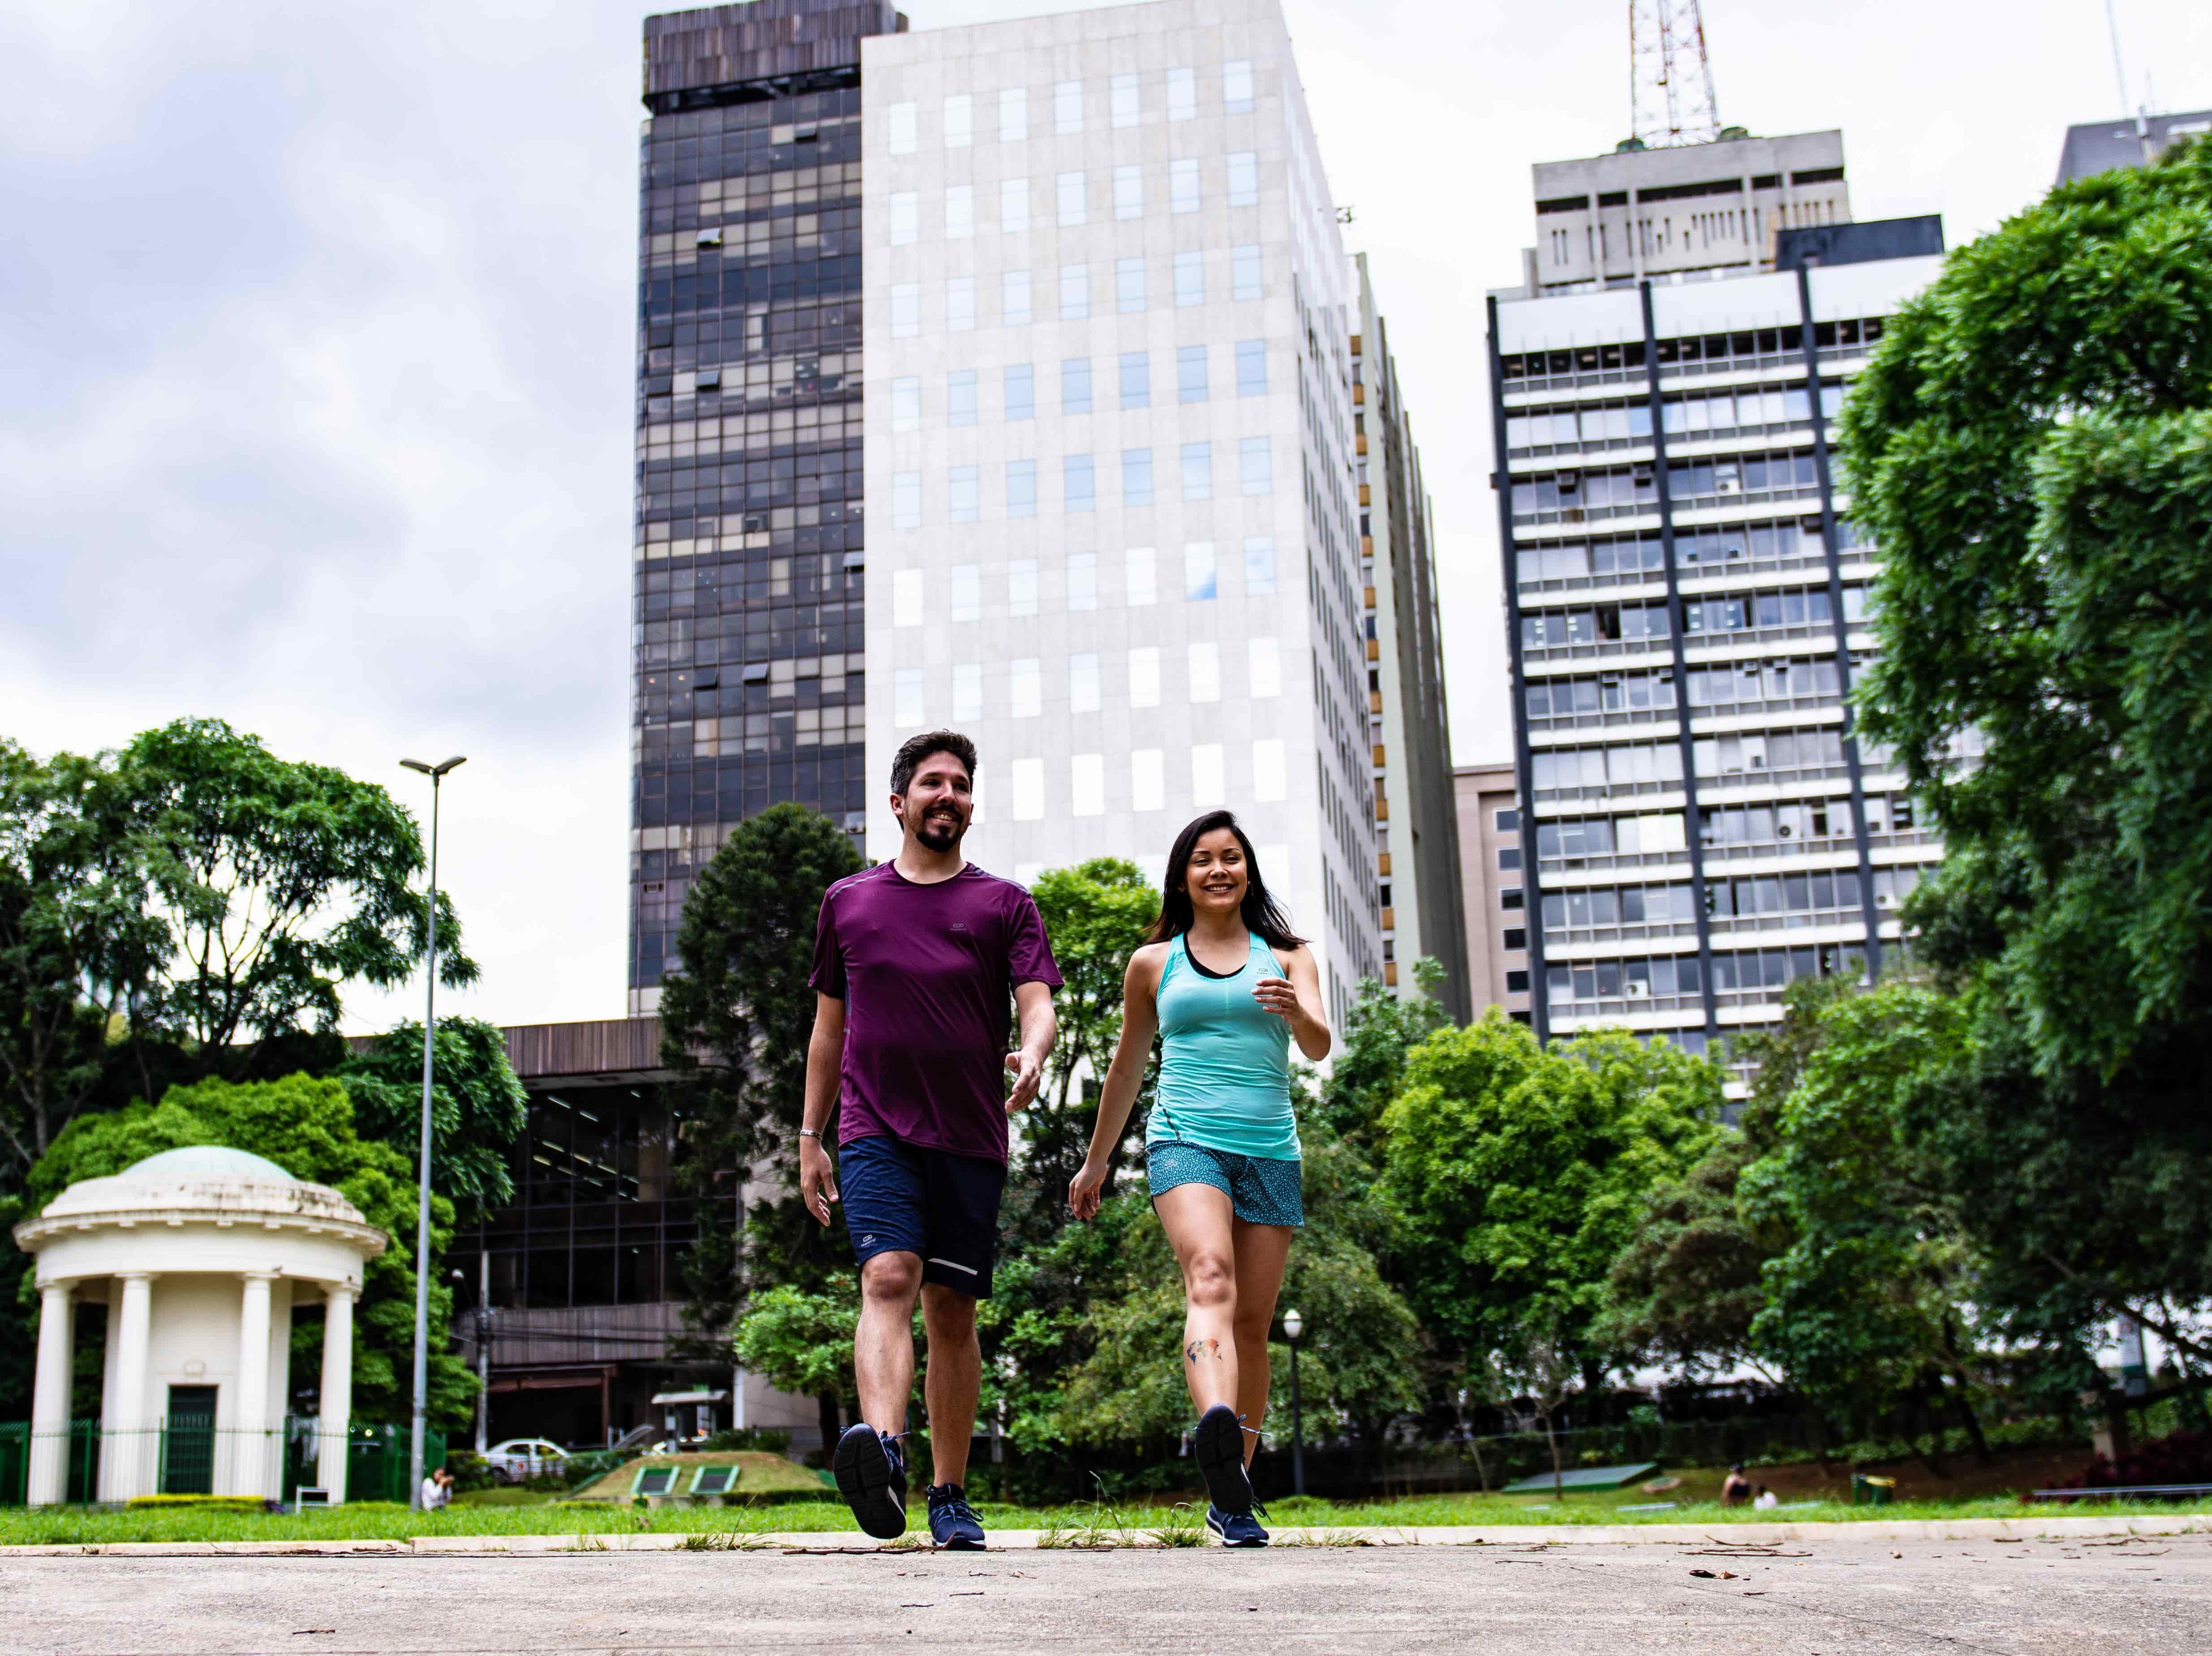 10,000 steps per day: an urban legend?